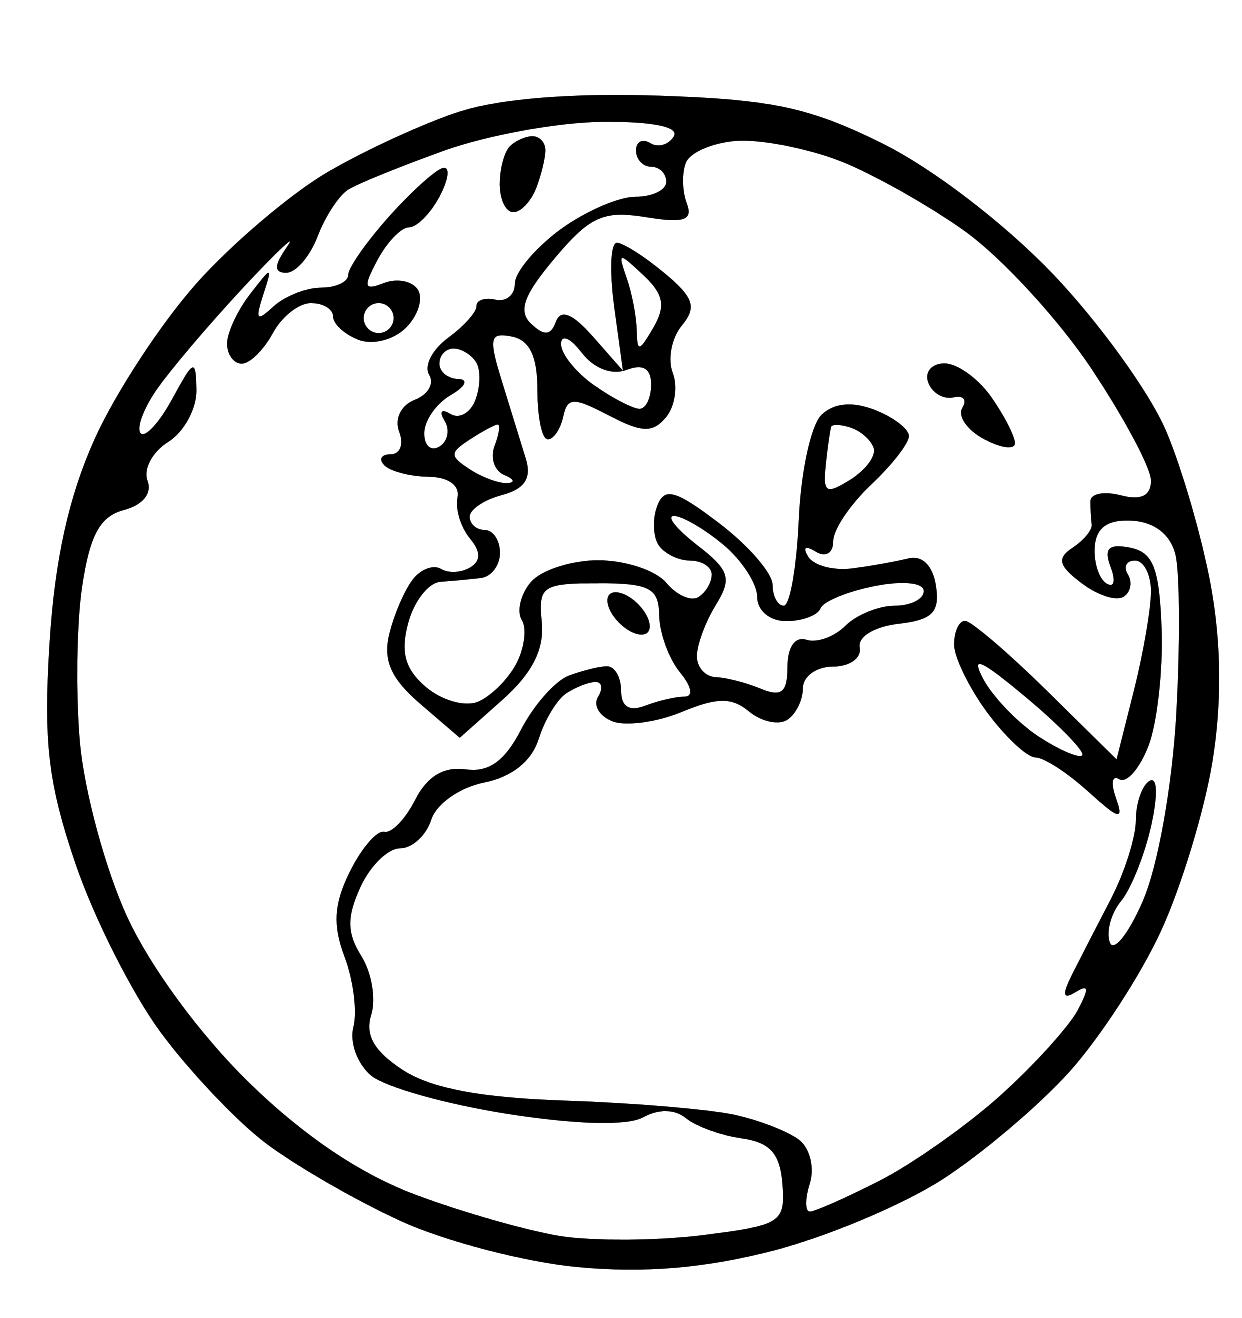 Earth Clip Art Black And White